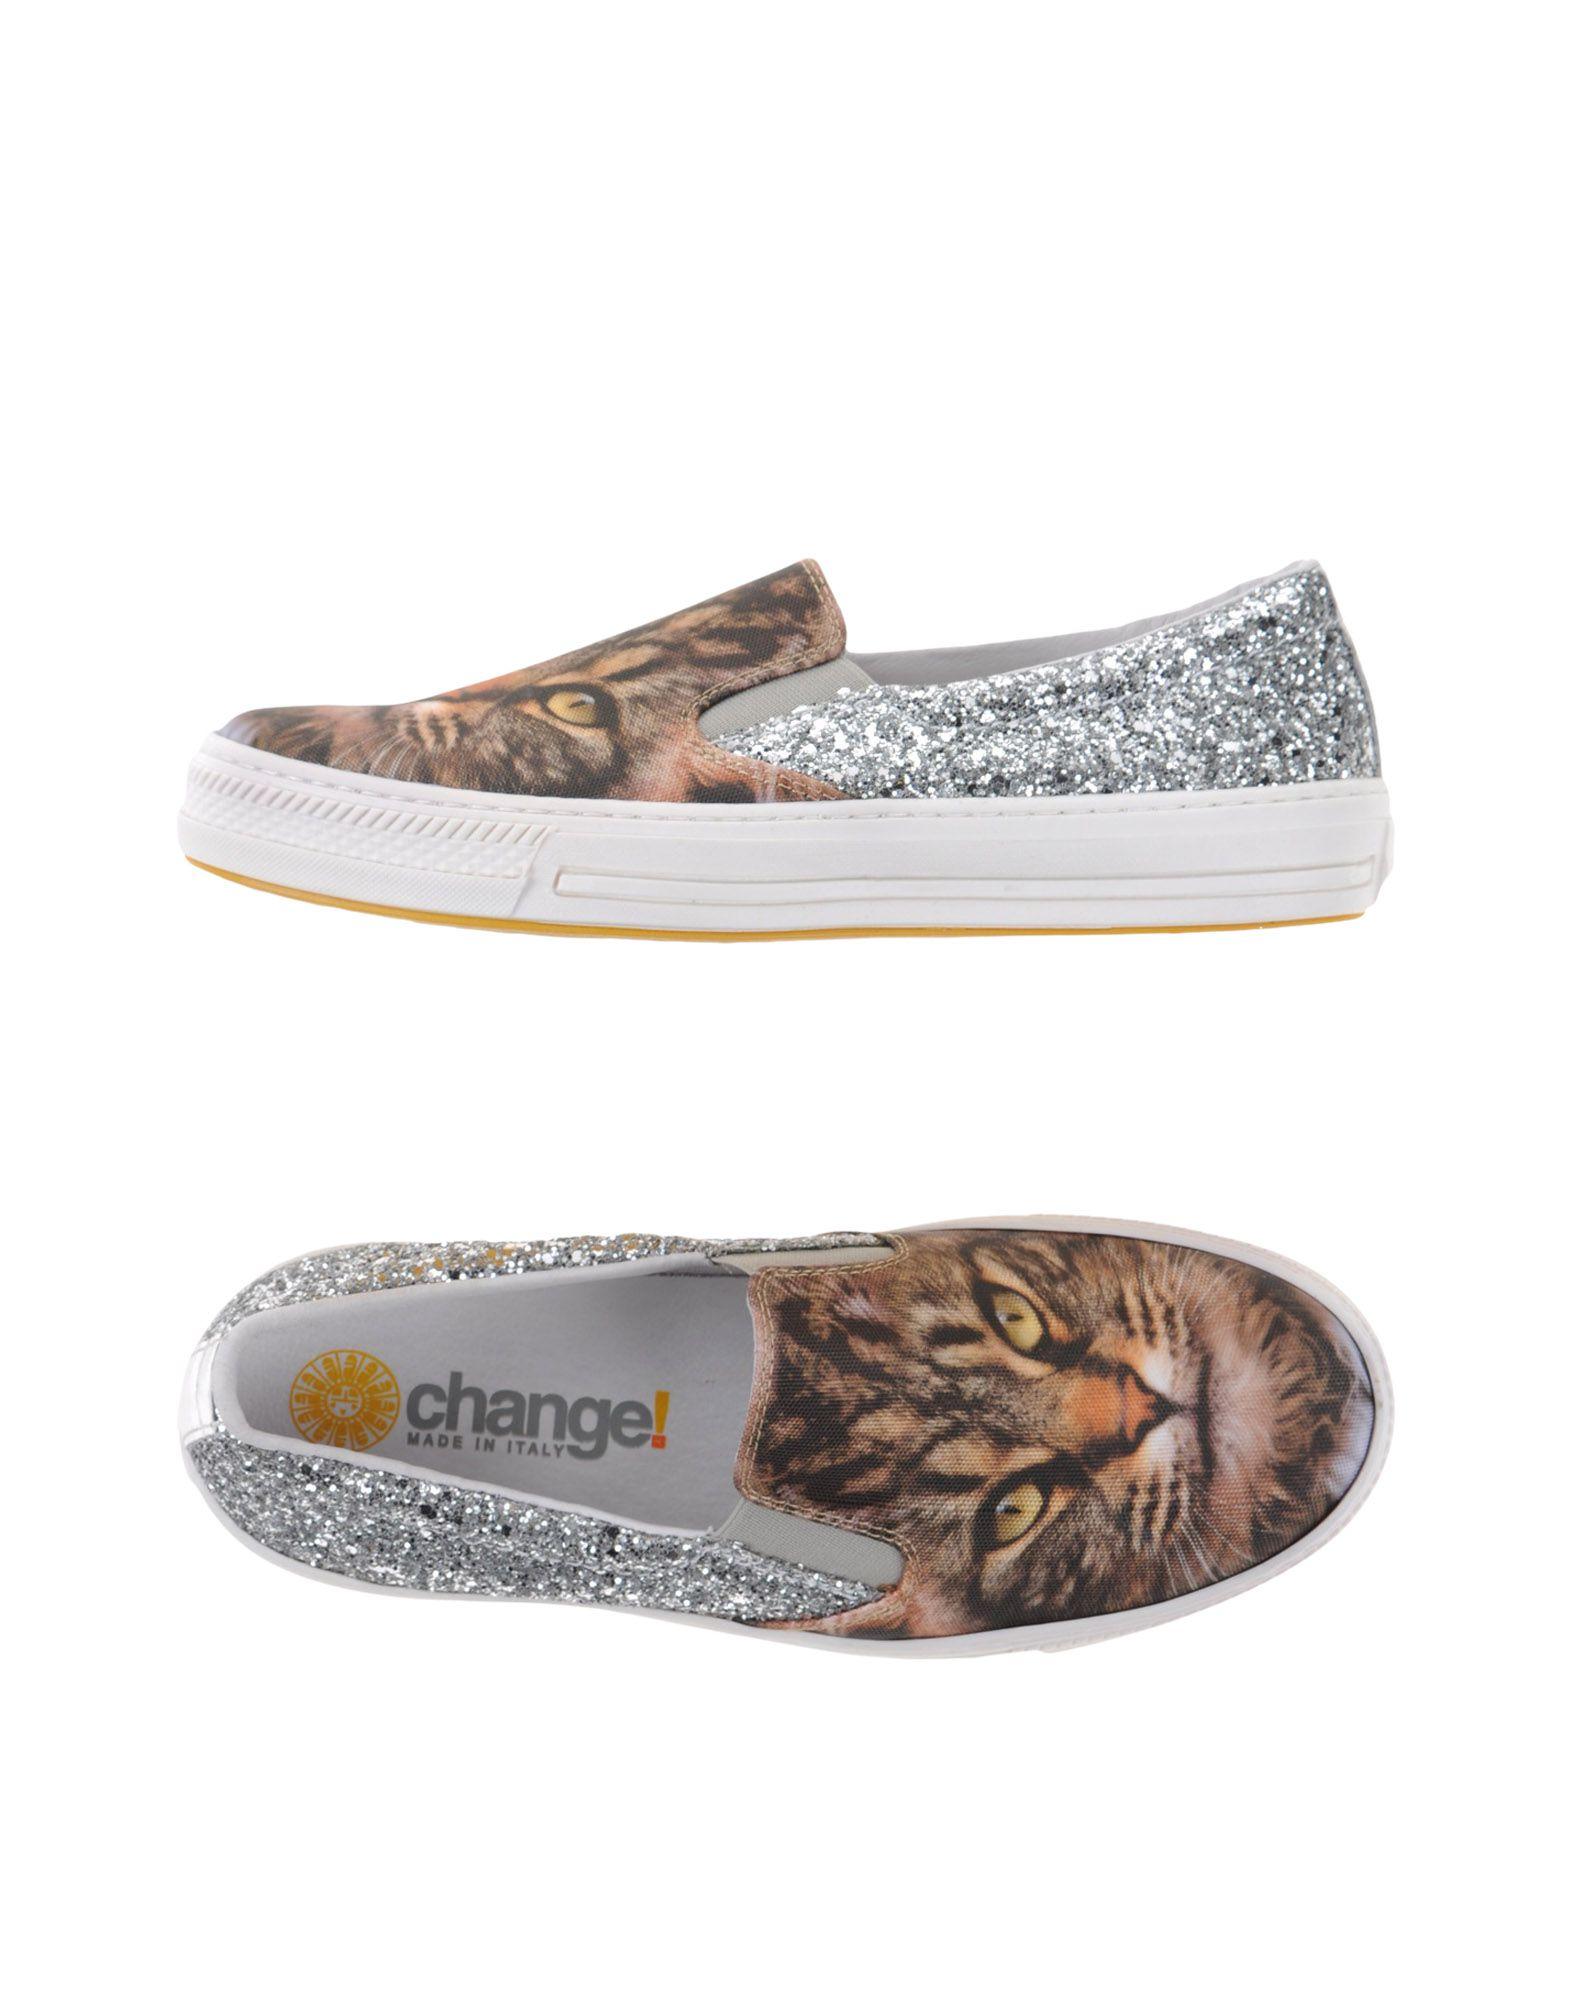 Change Gute Sneakers Damen  11001372FO Gute Change Qualität beliebte Schuhe 461113